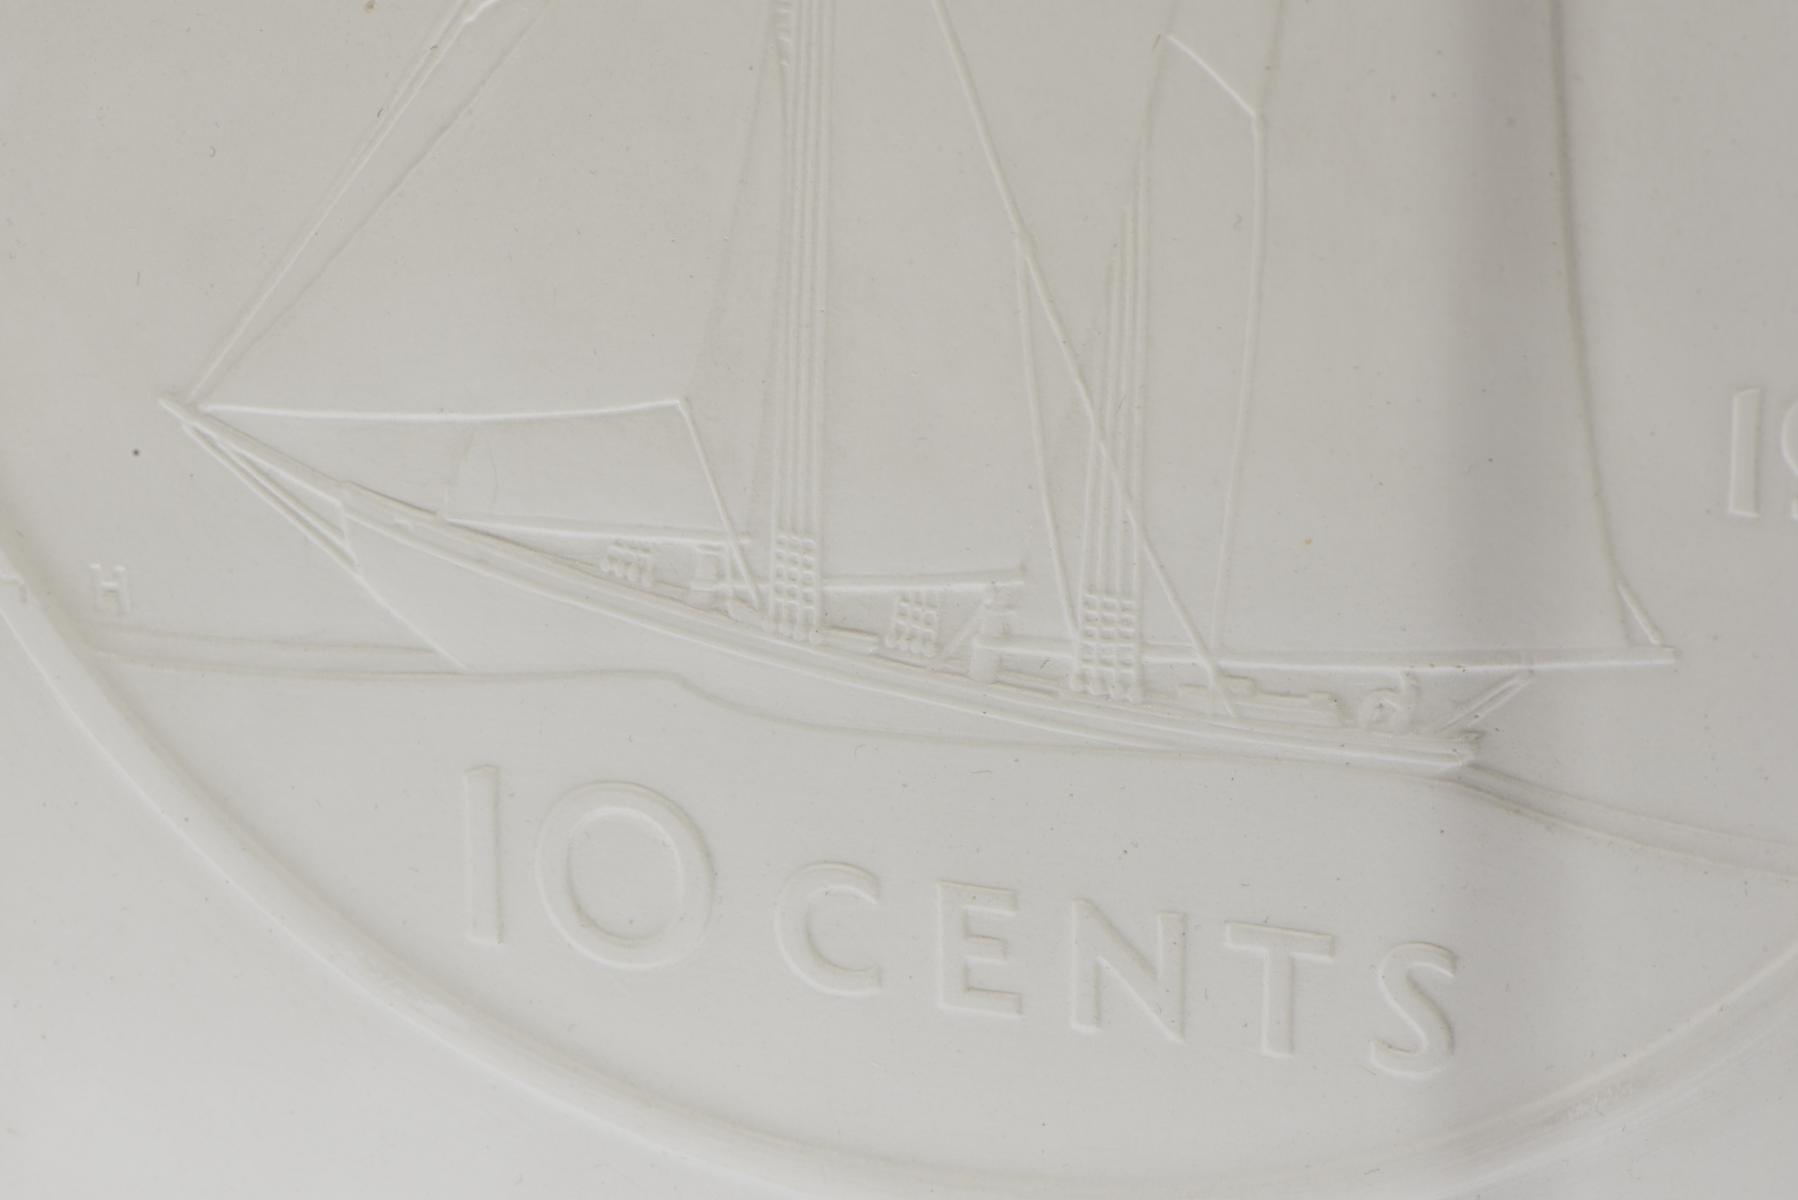 plaster cast of Canadian dime